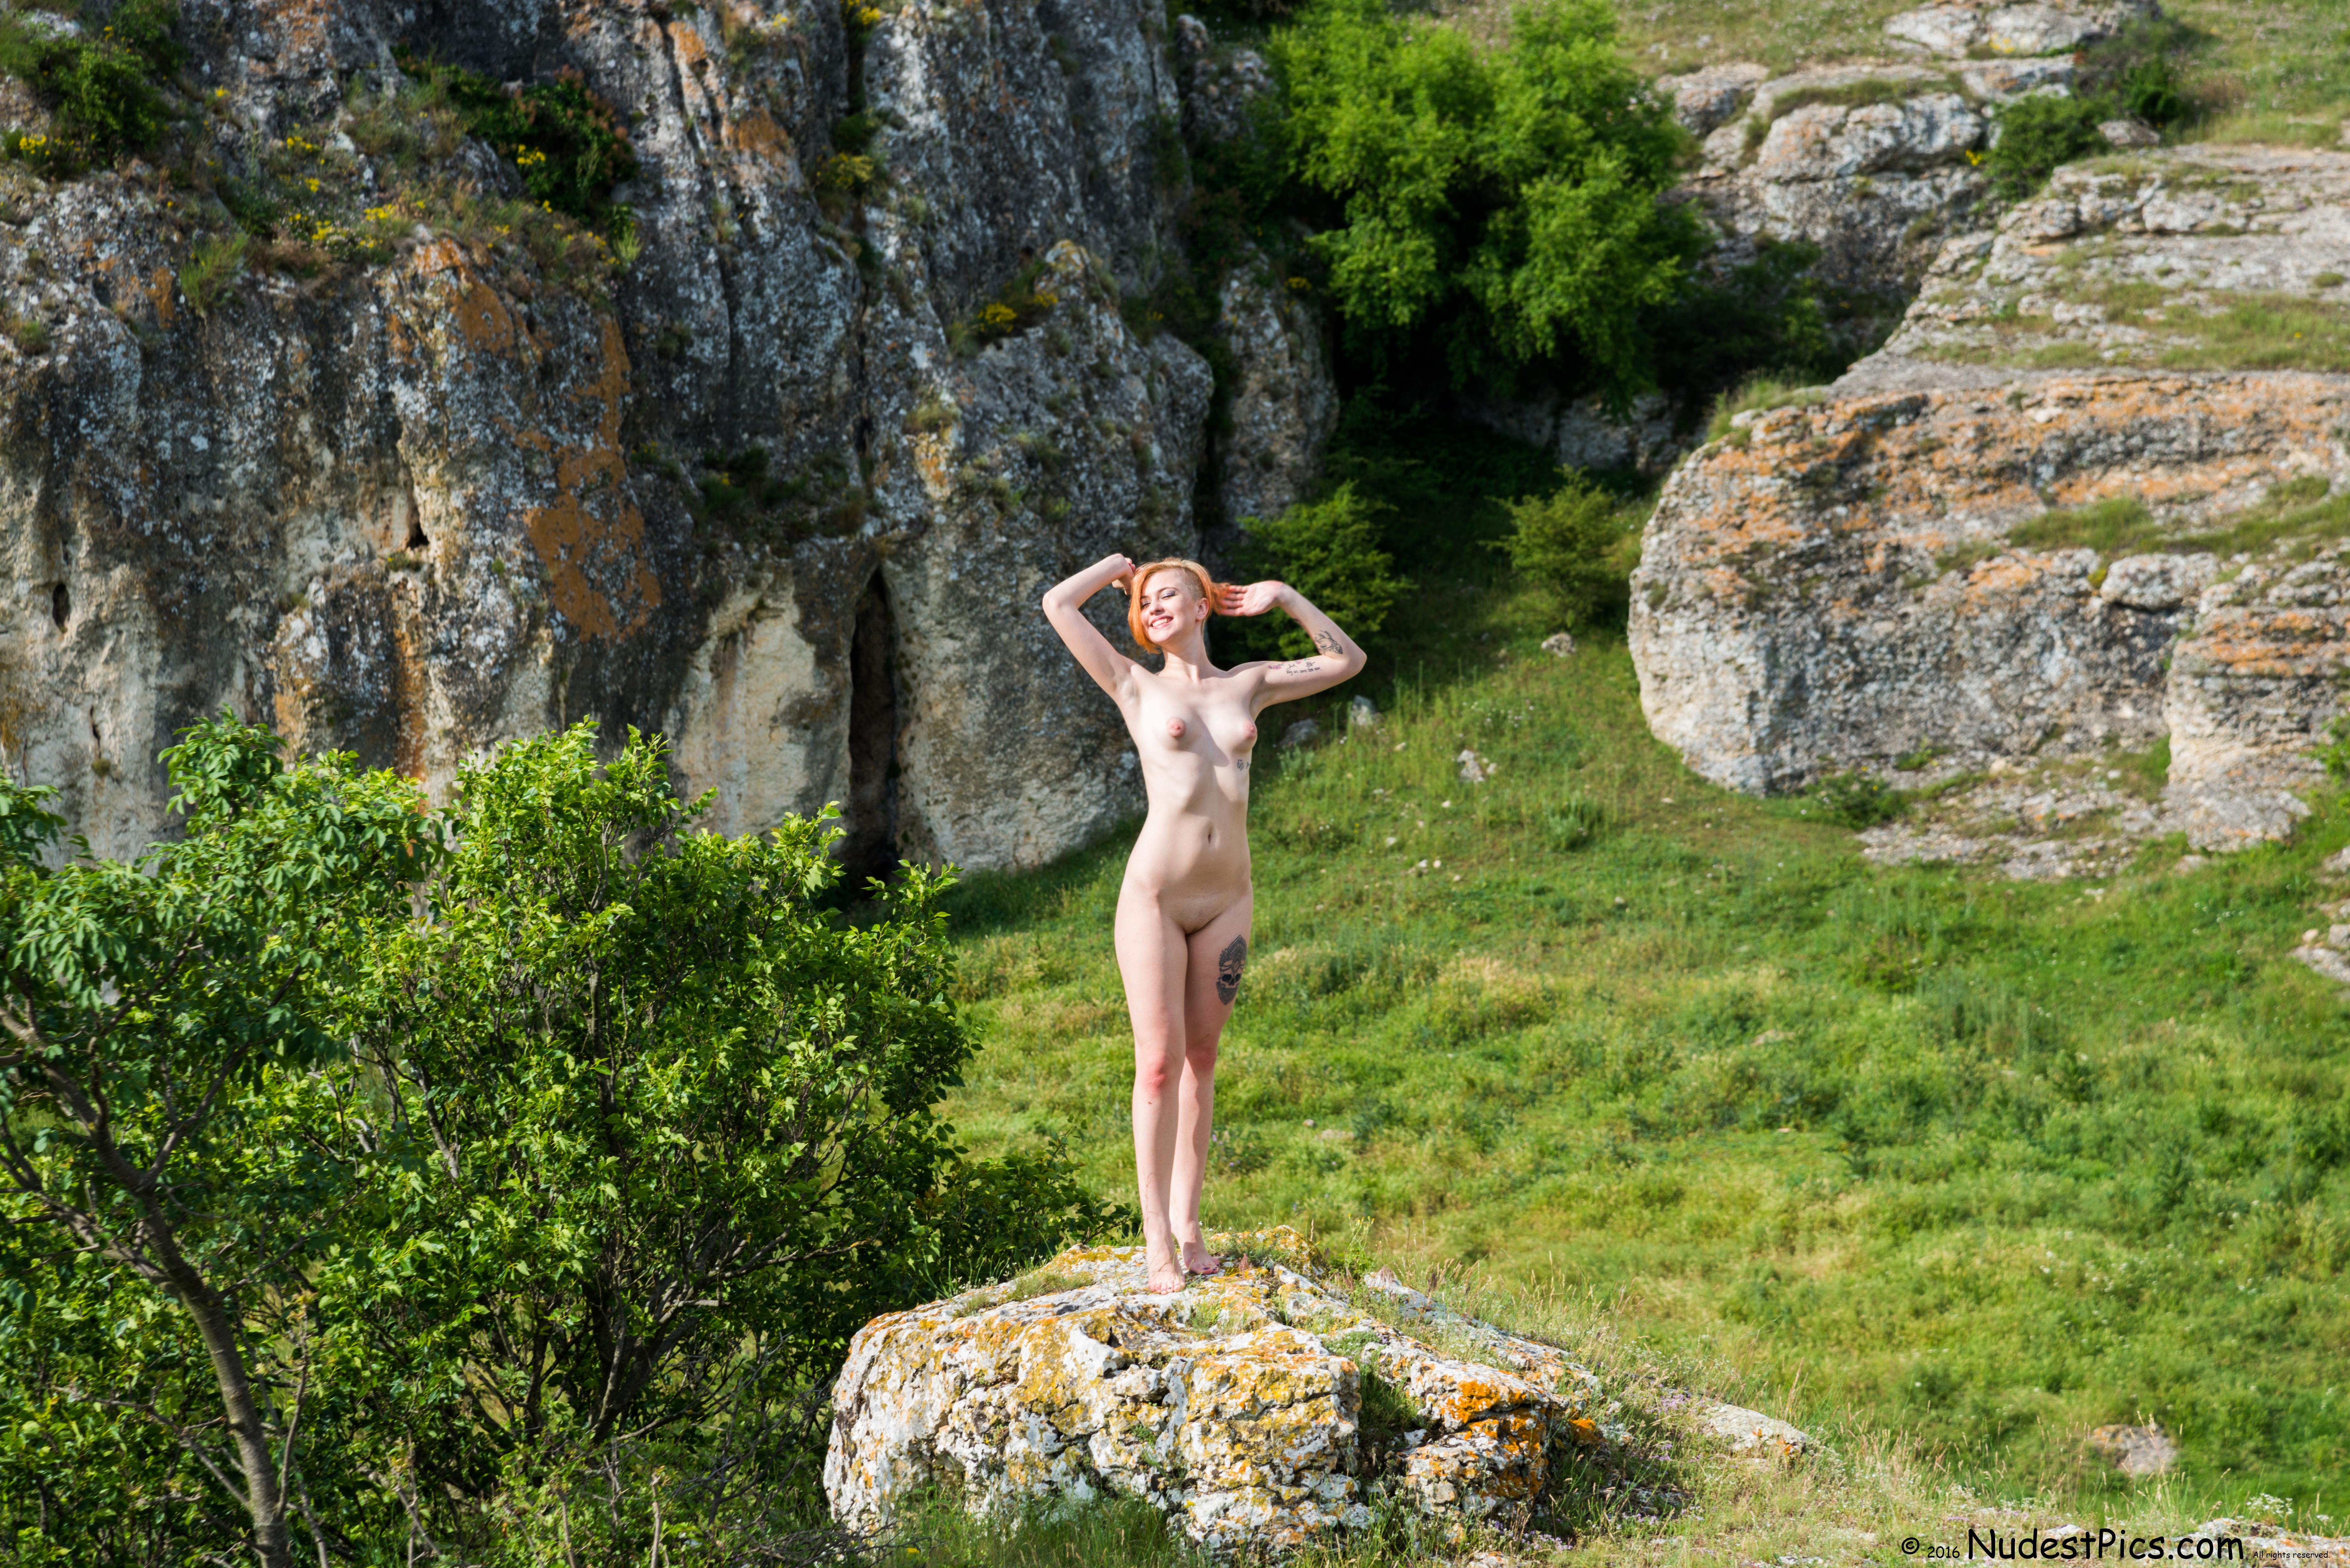 Happy Nudist Girl in Nature HD